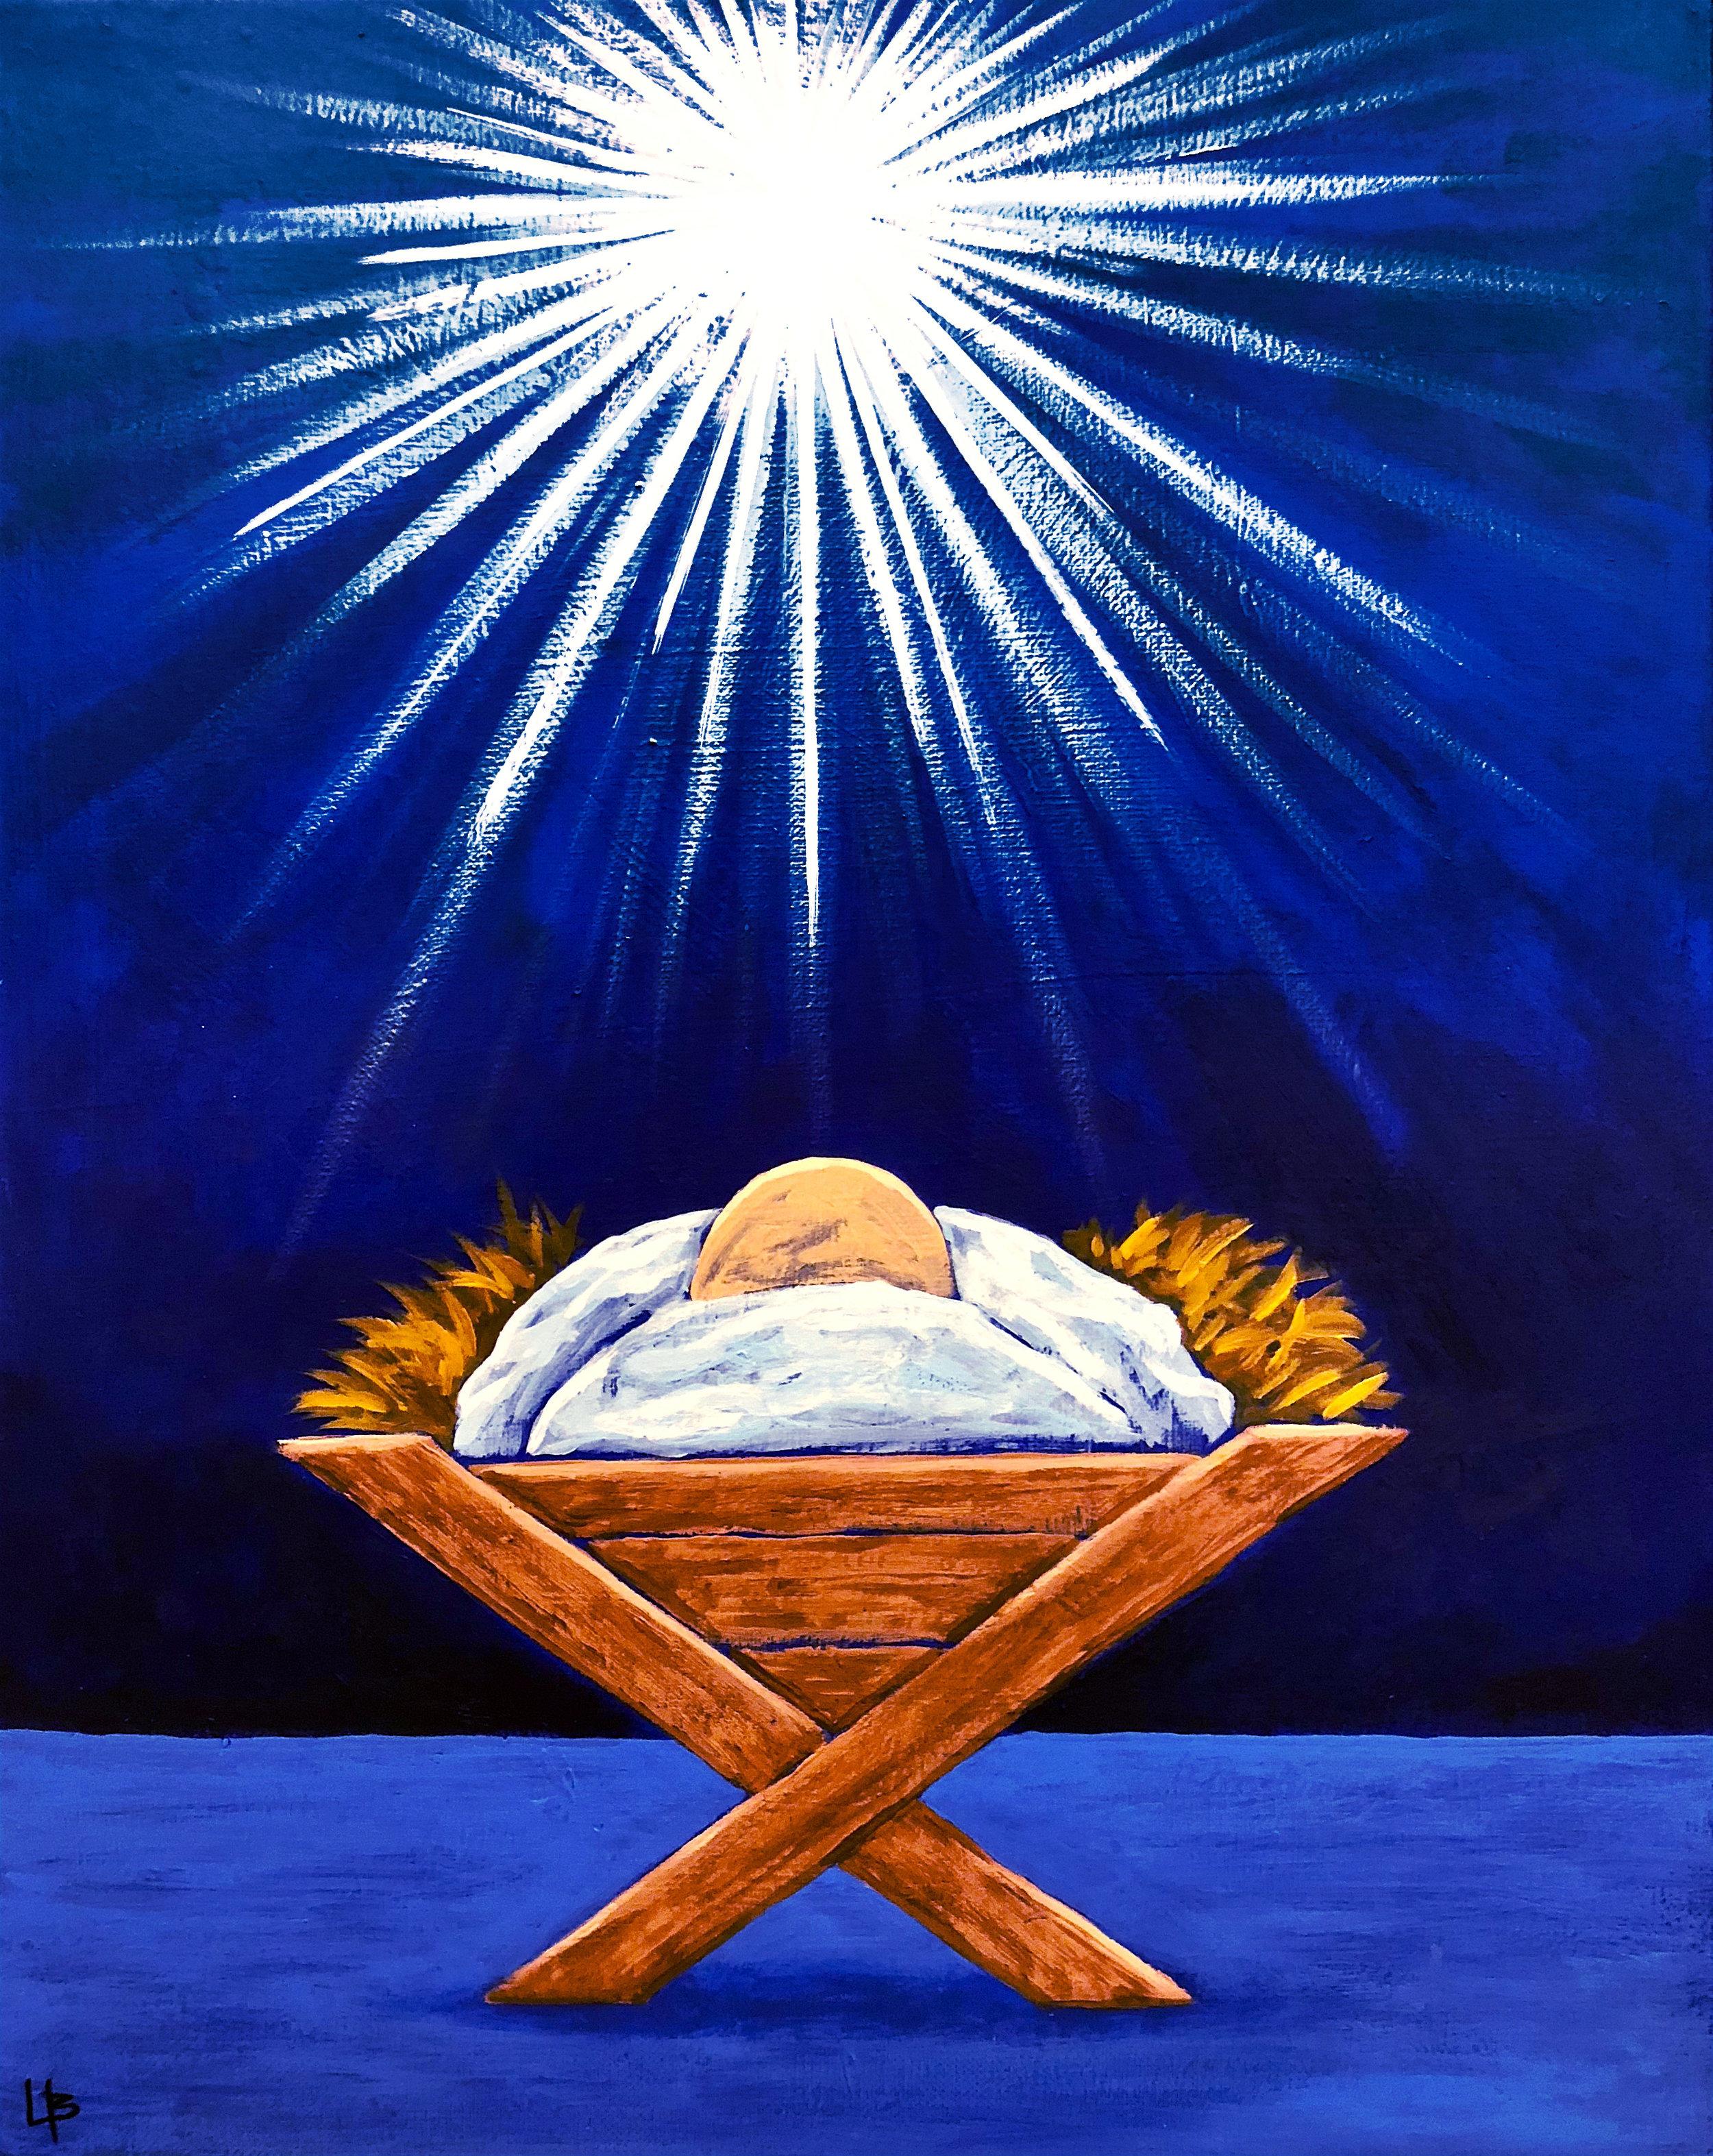 Christmas manger baby jesus christ north star